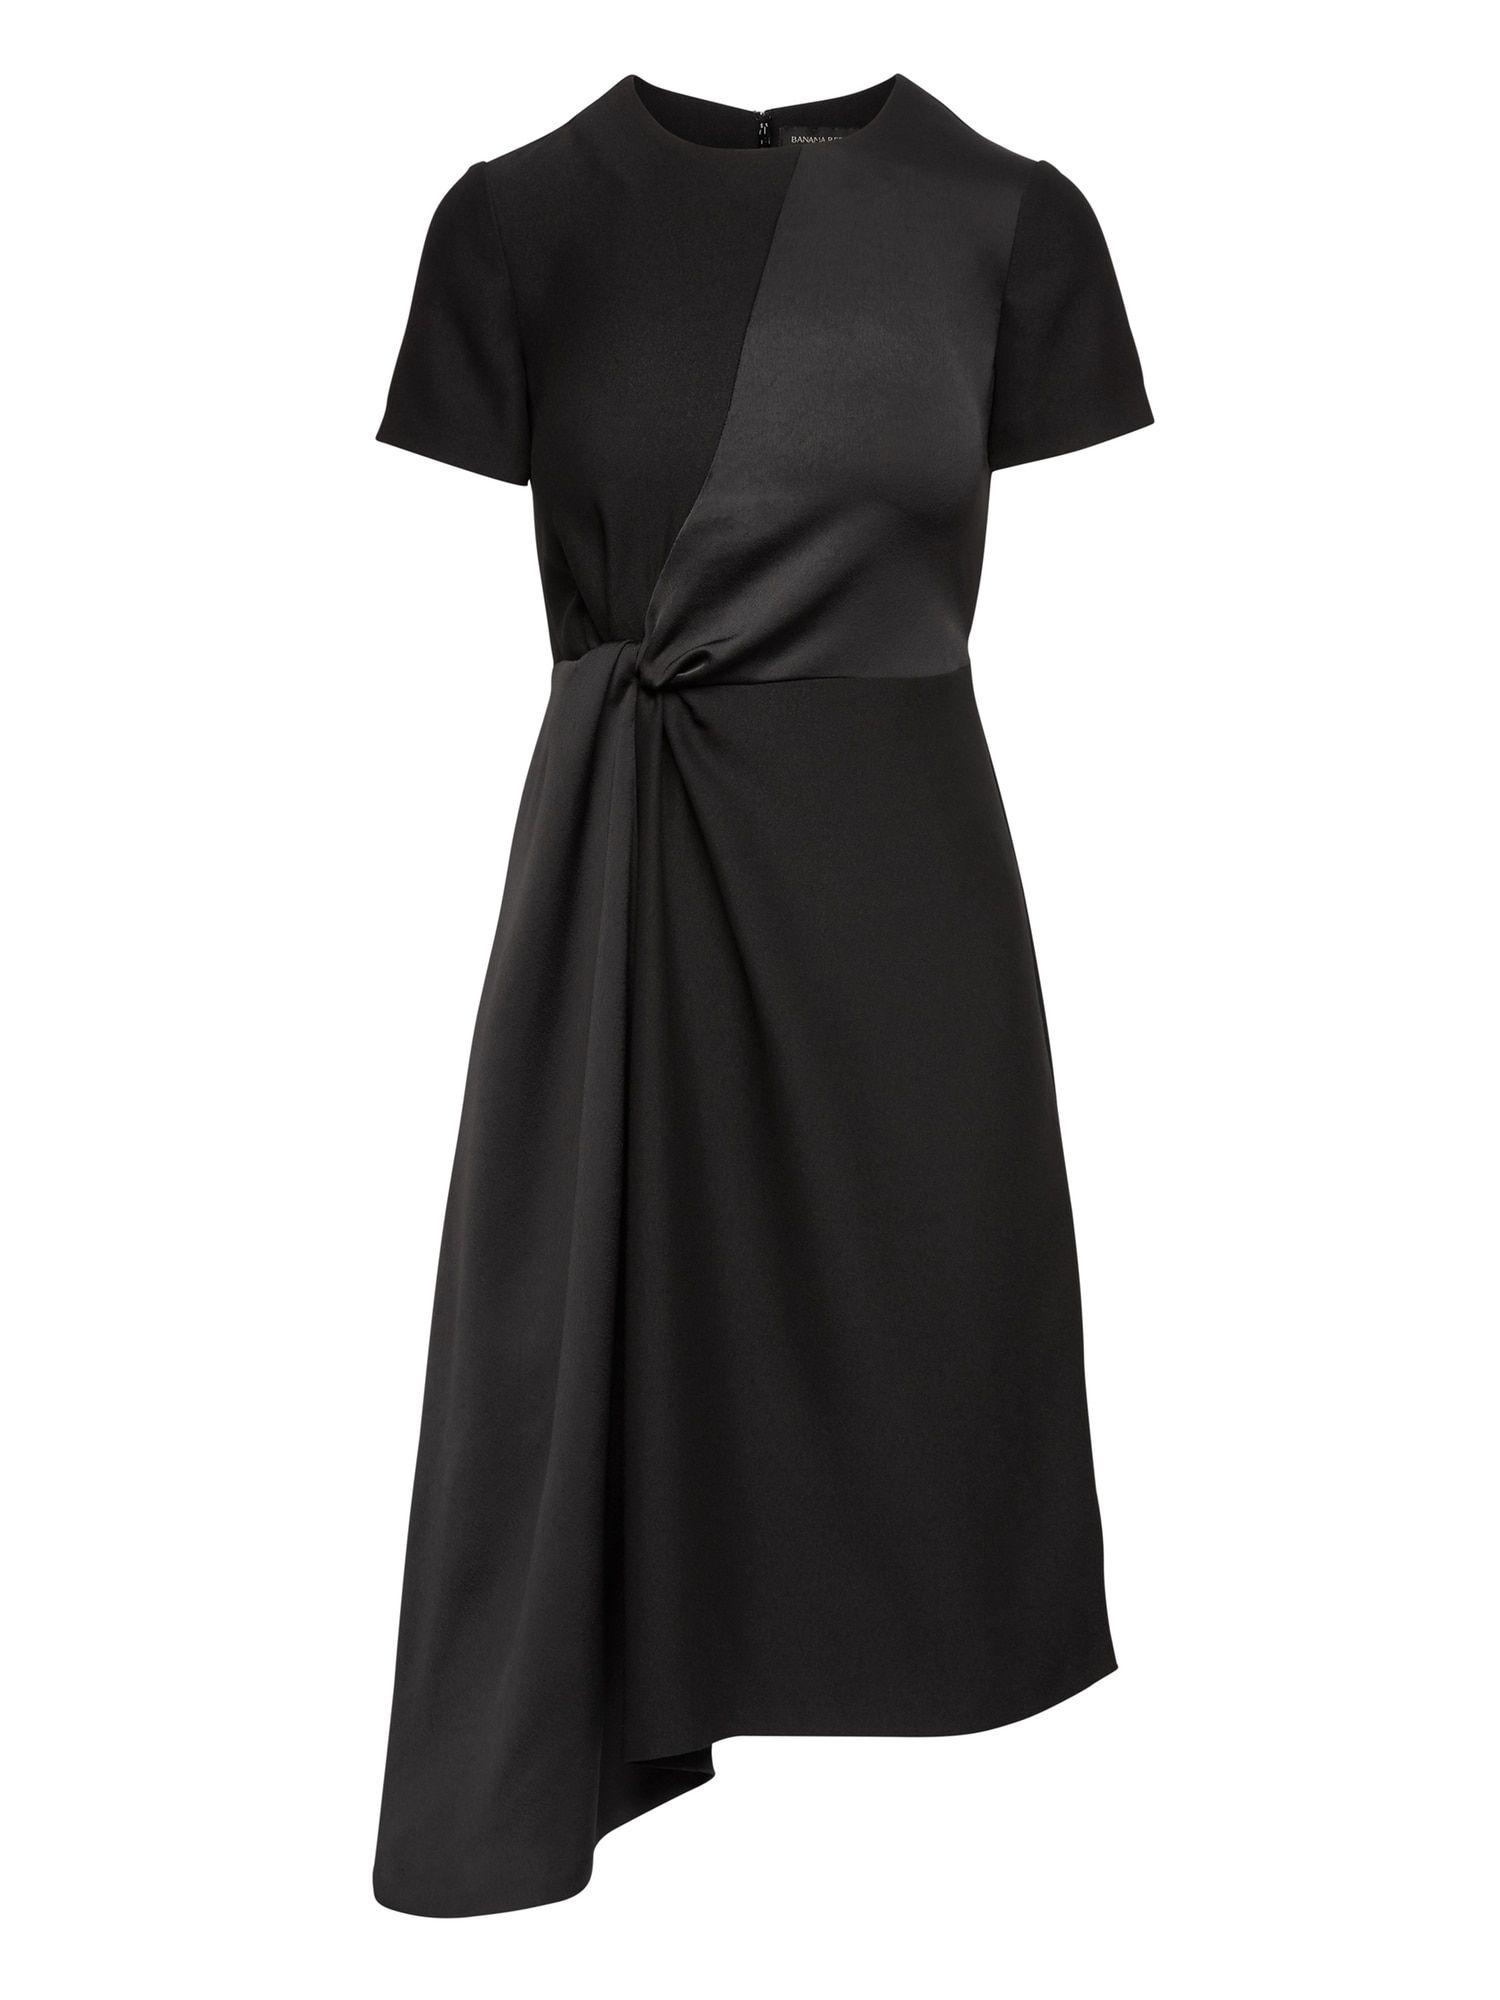 2f3b2e7ec0 Mixed-Media Fit-And-Flare Dress